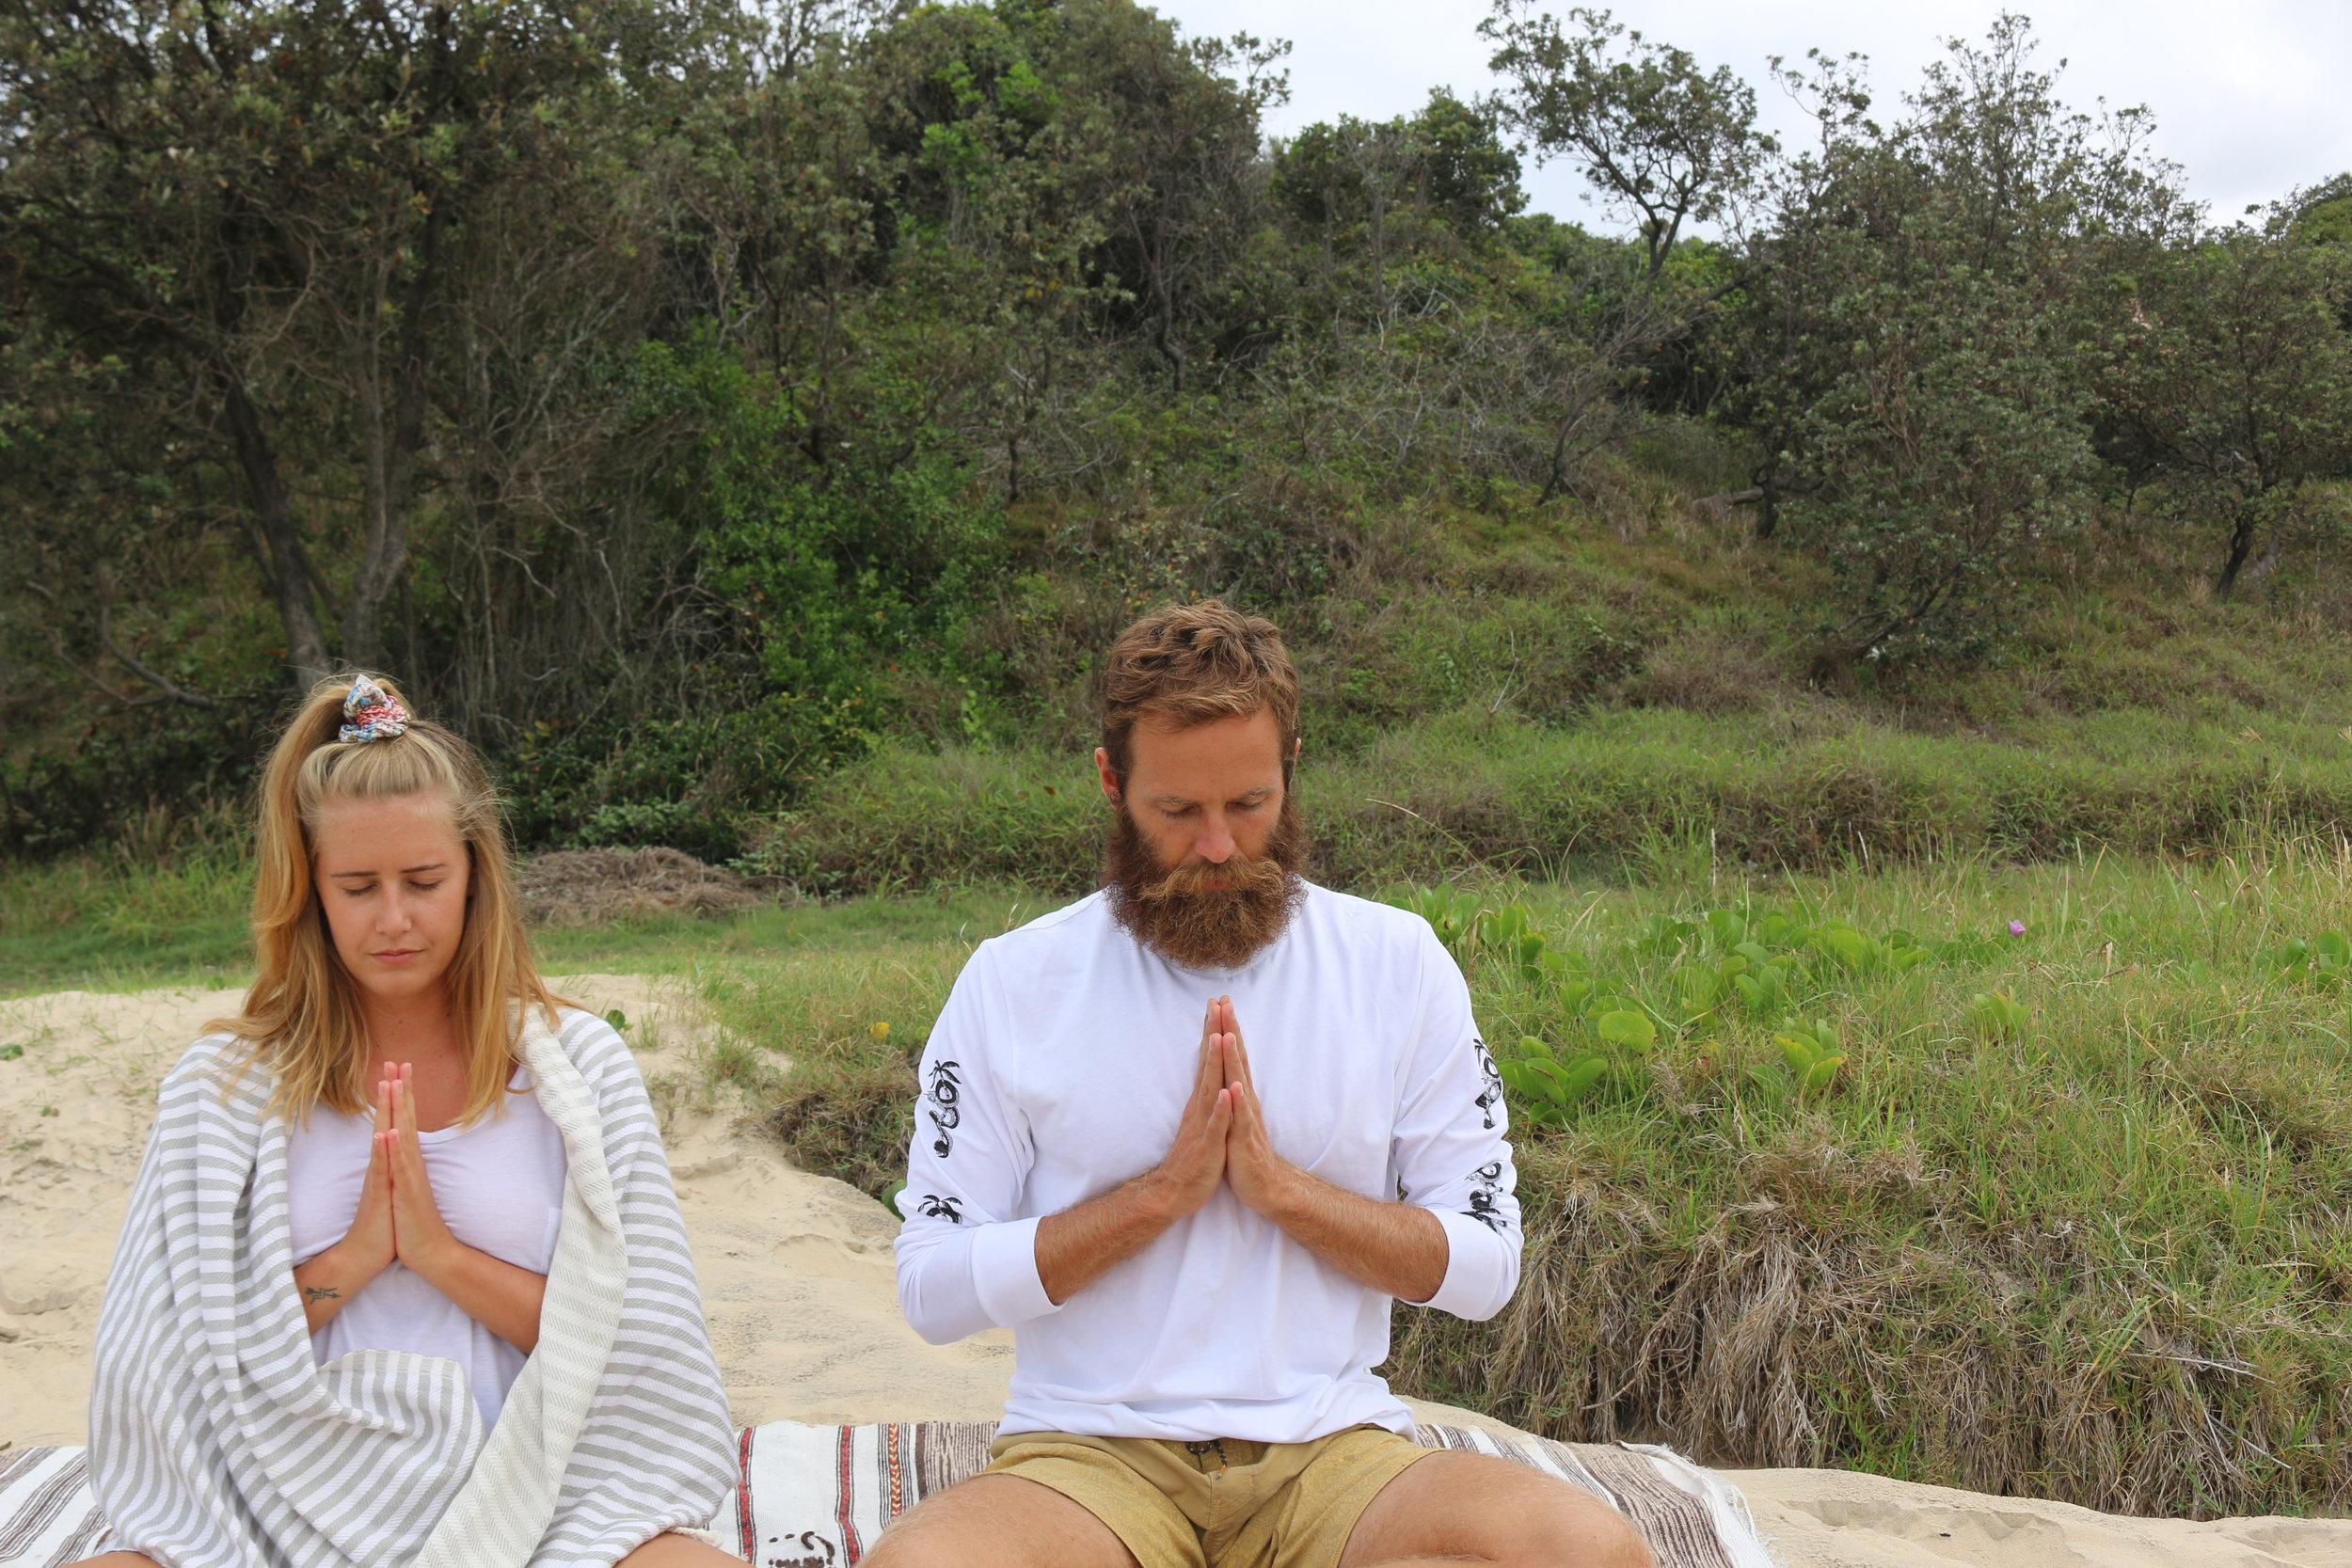 I teach meditation. -